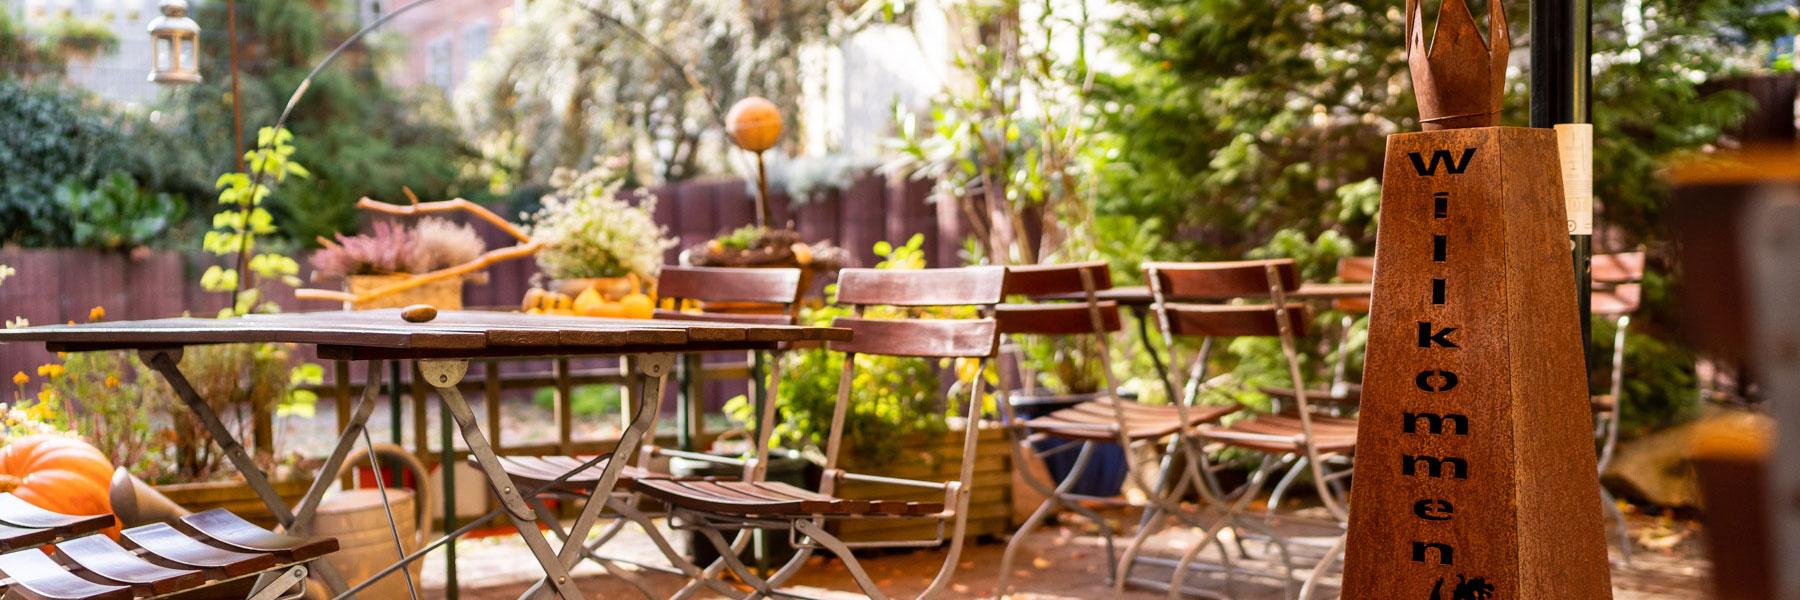 Garten - Hotel - Pension am Theater